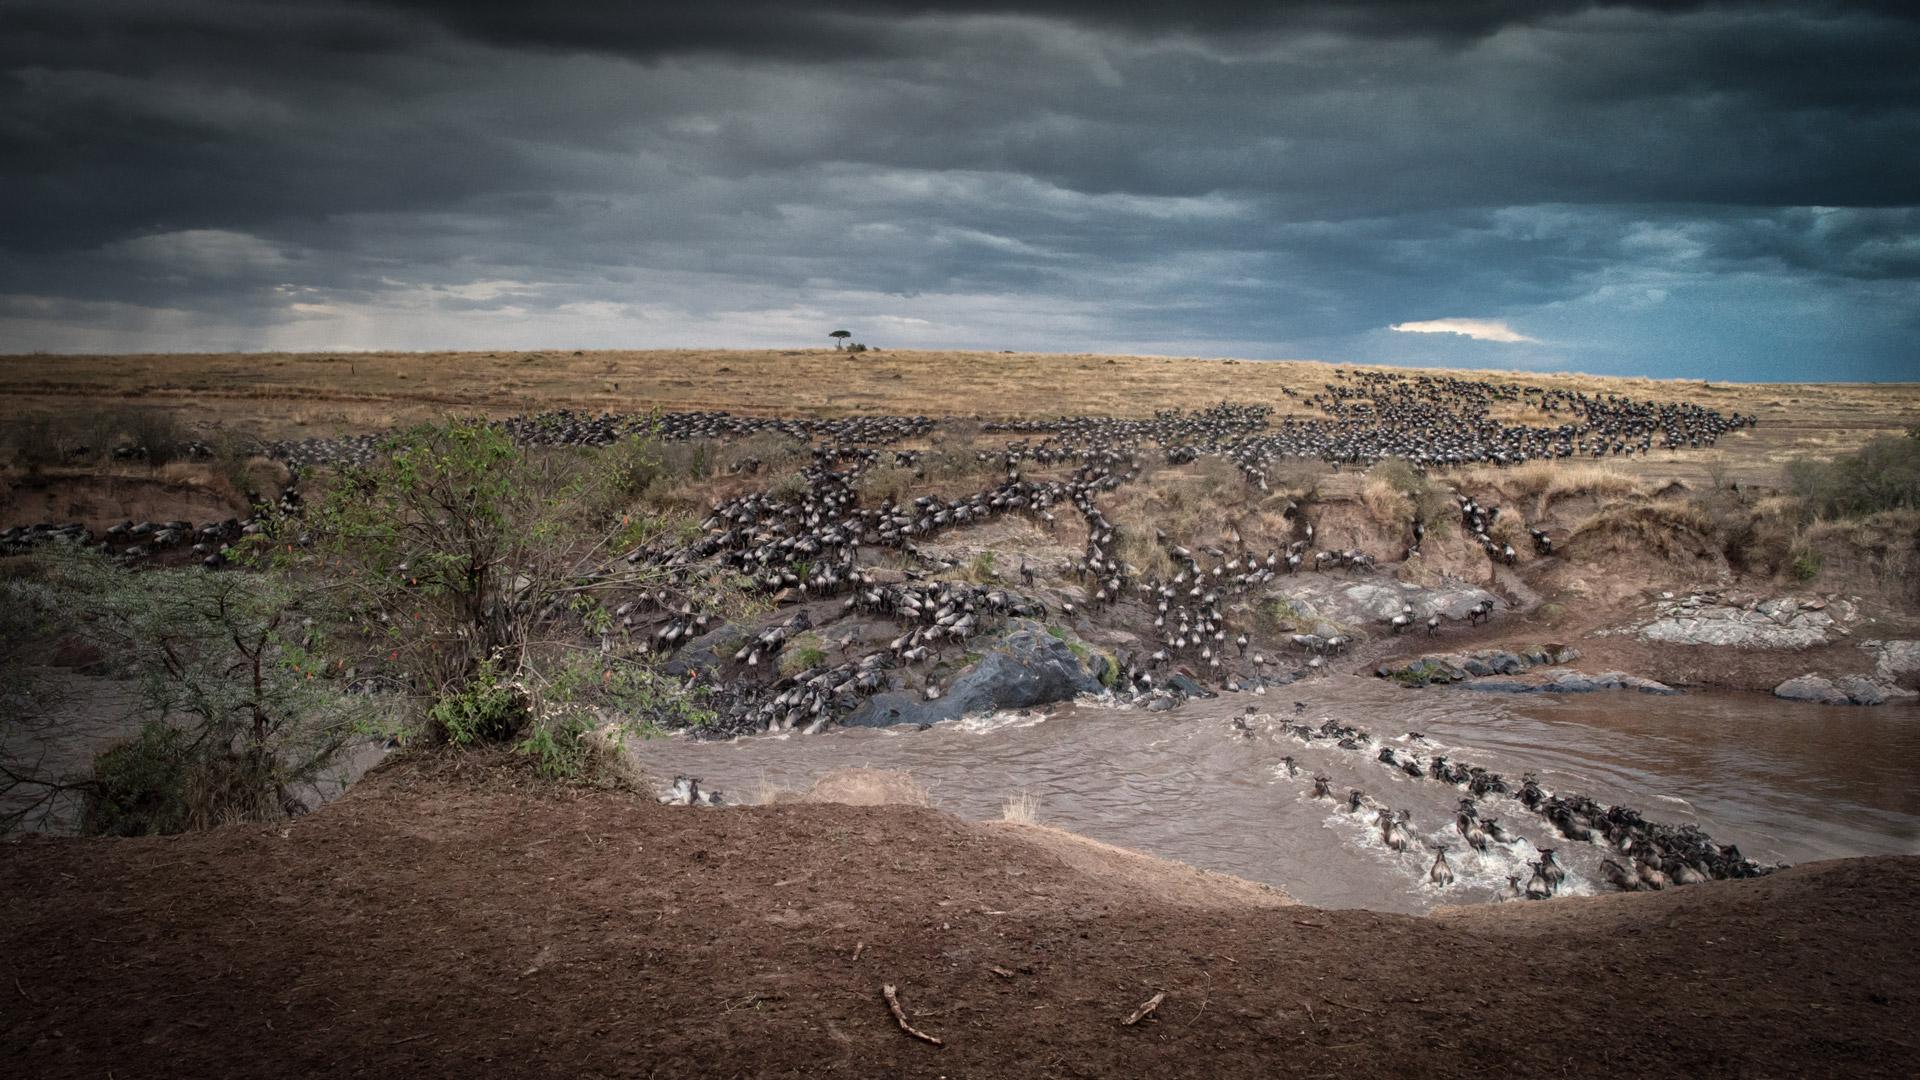 Wildebeest migration crossing river in Maasai Mara, Kenya